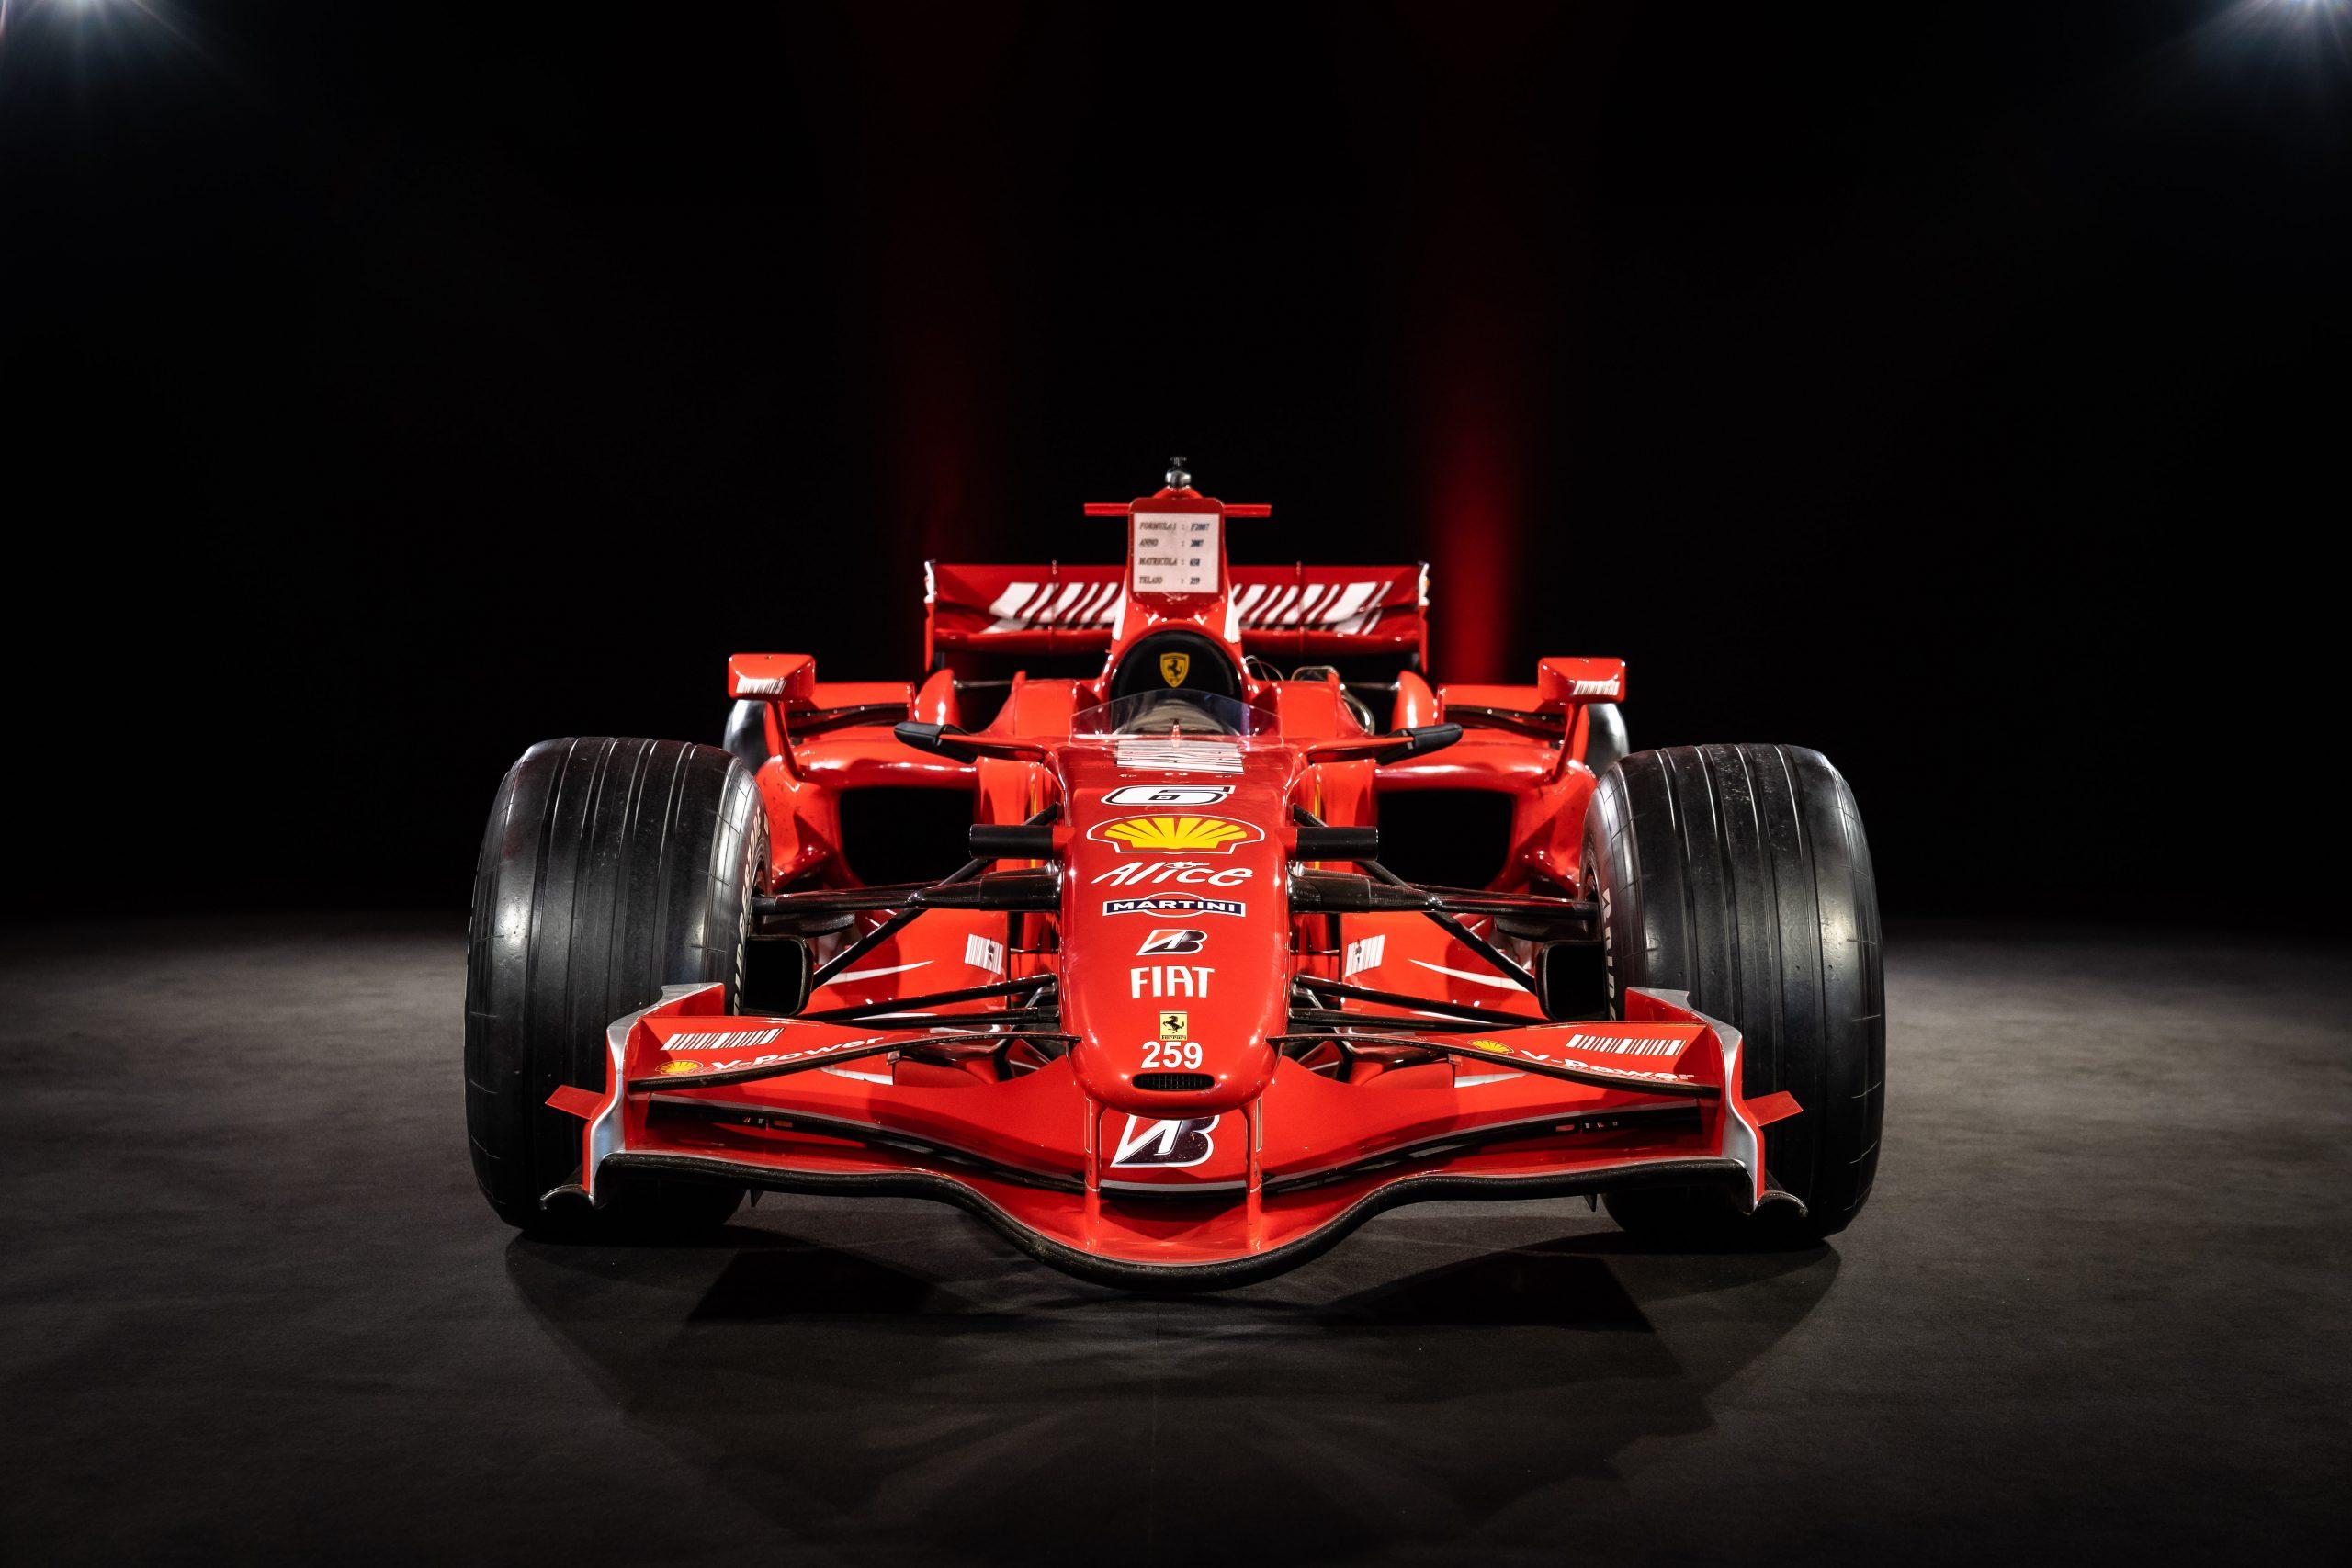 Ferrari F2007 - Front